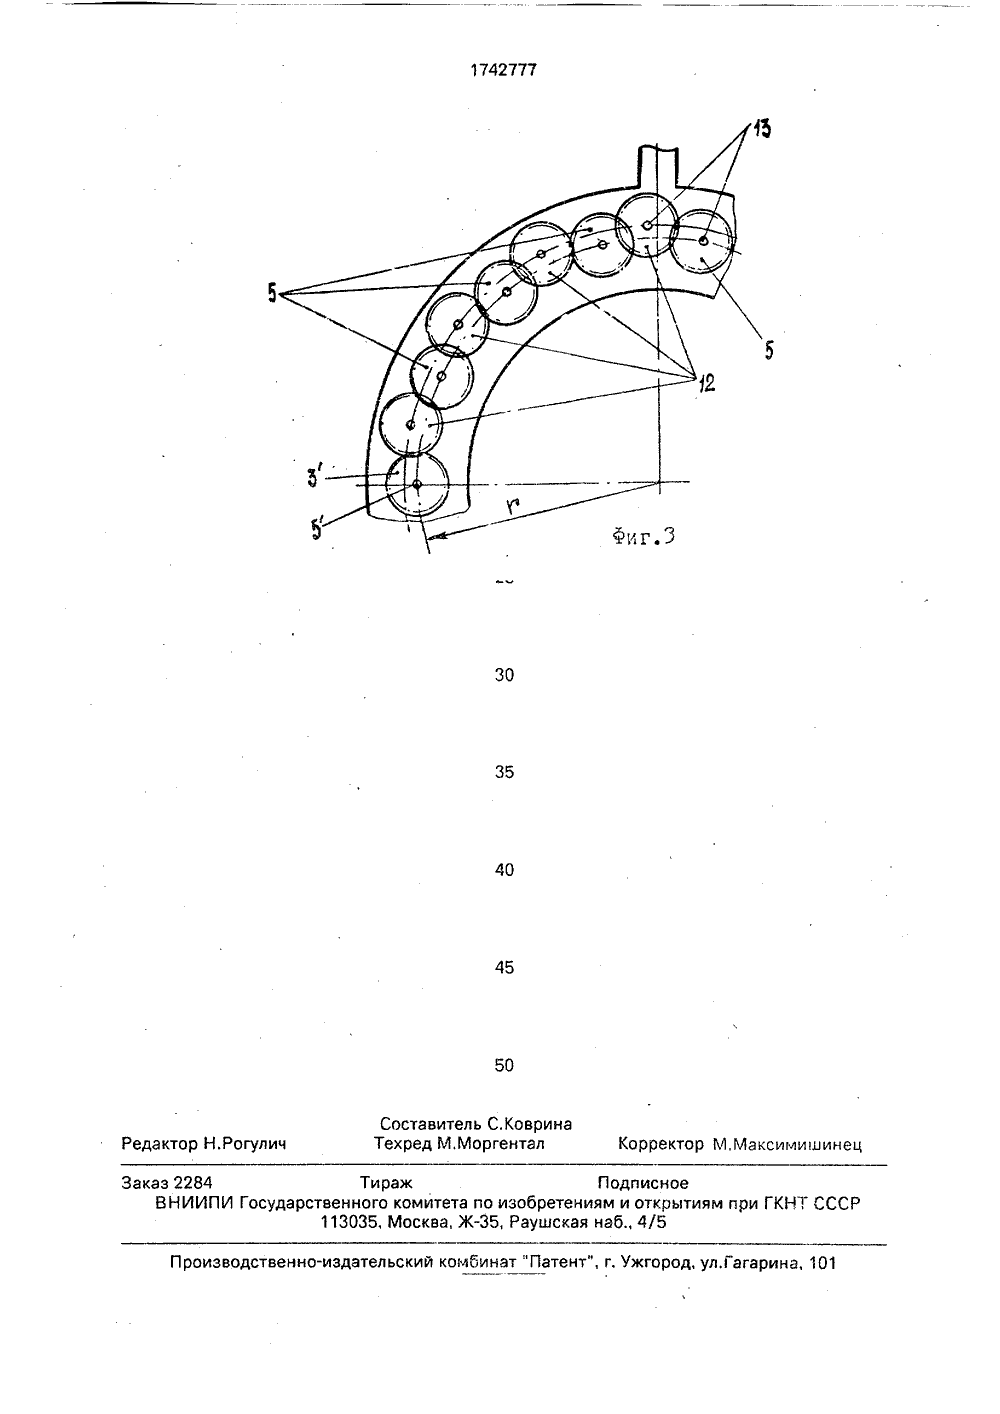 Ирисовая диафрагма чертежи